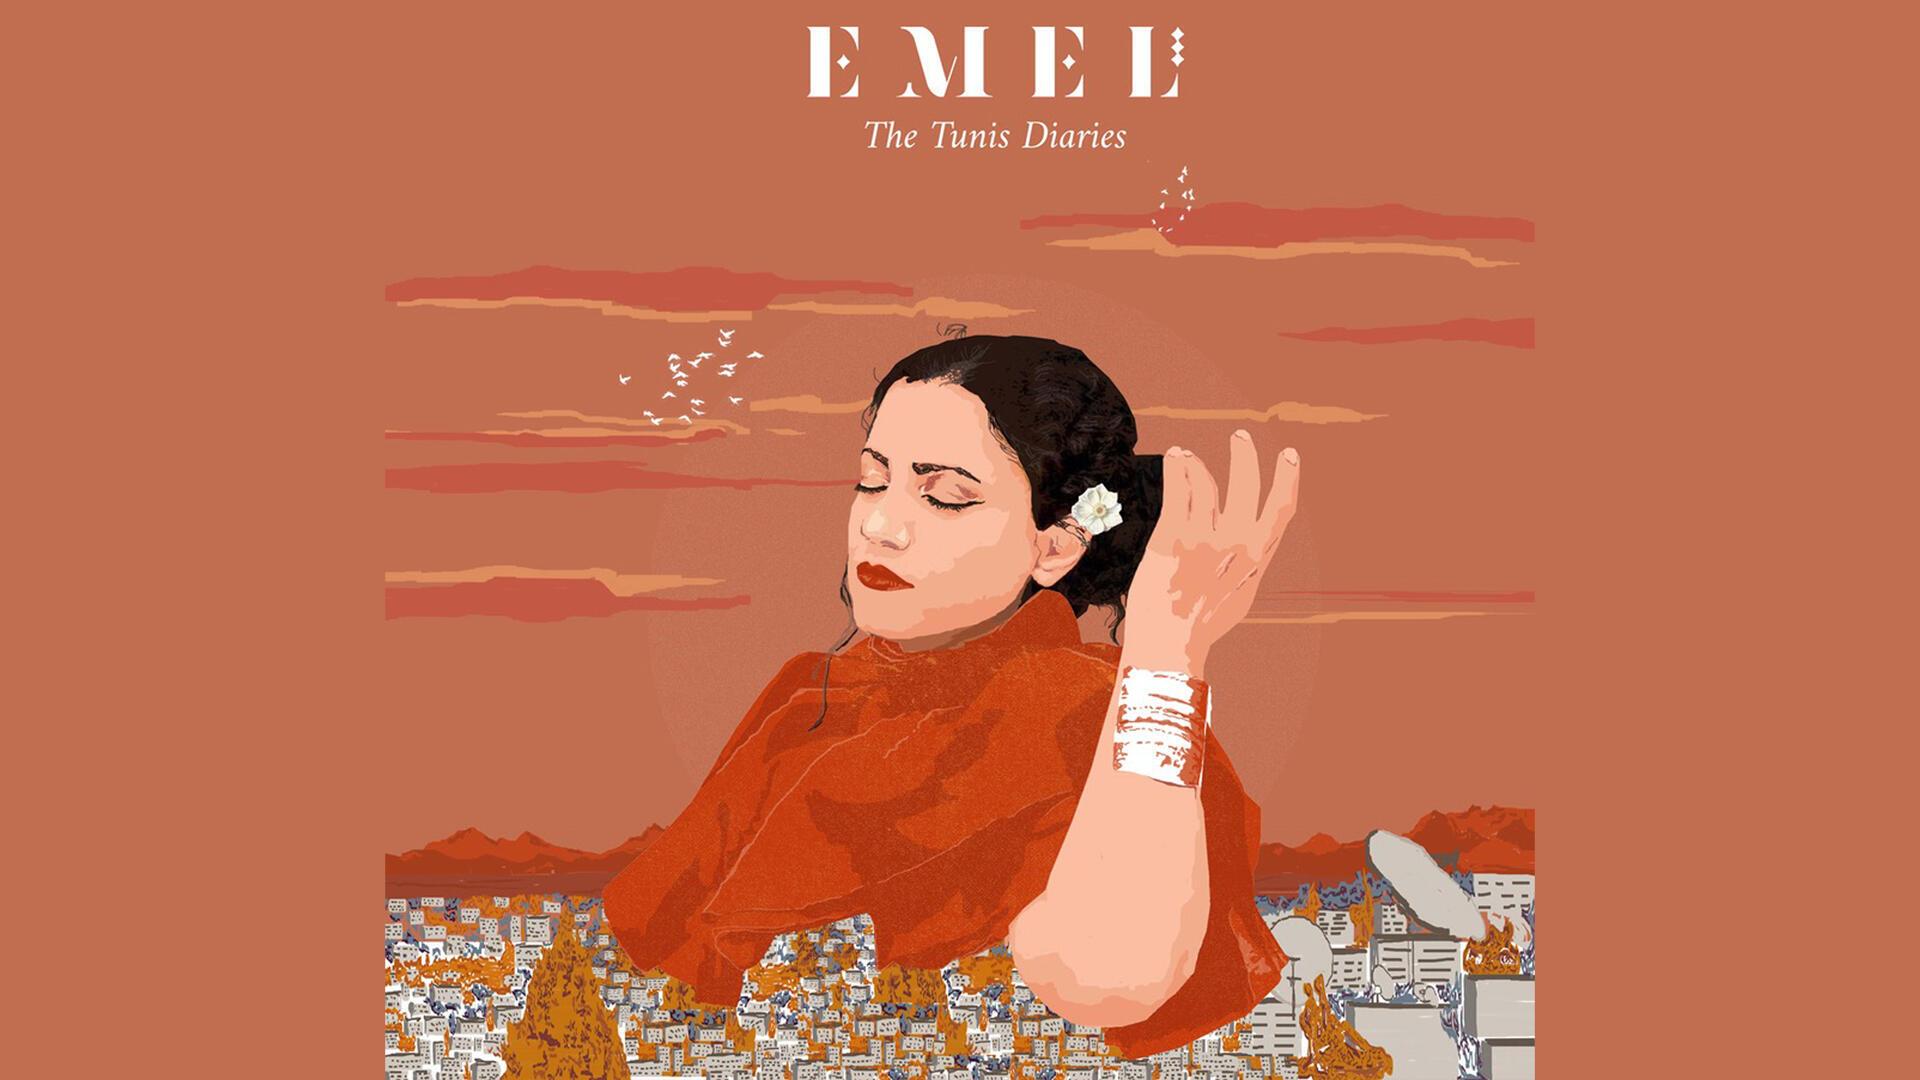 Emel, The Tunis Diaries.